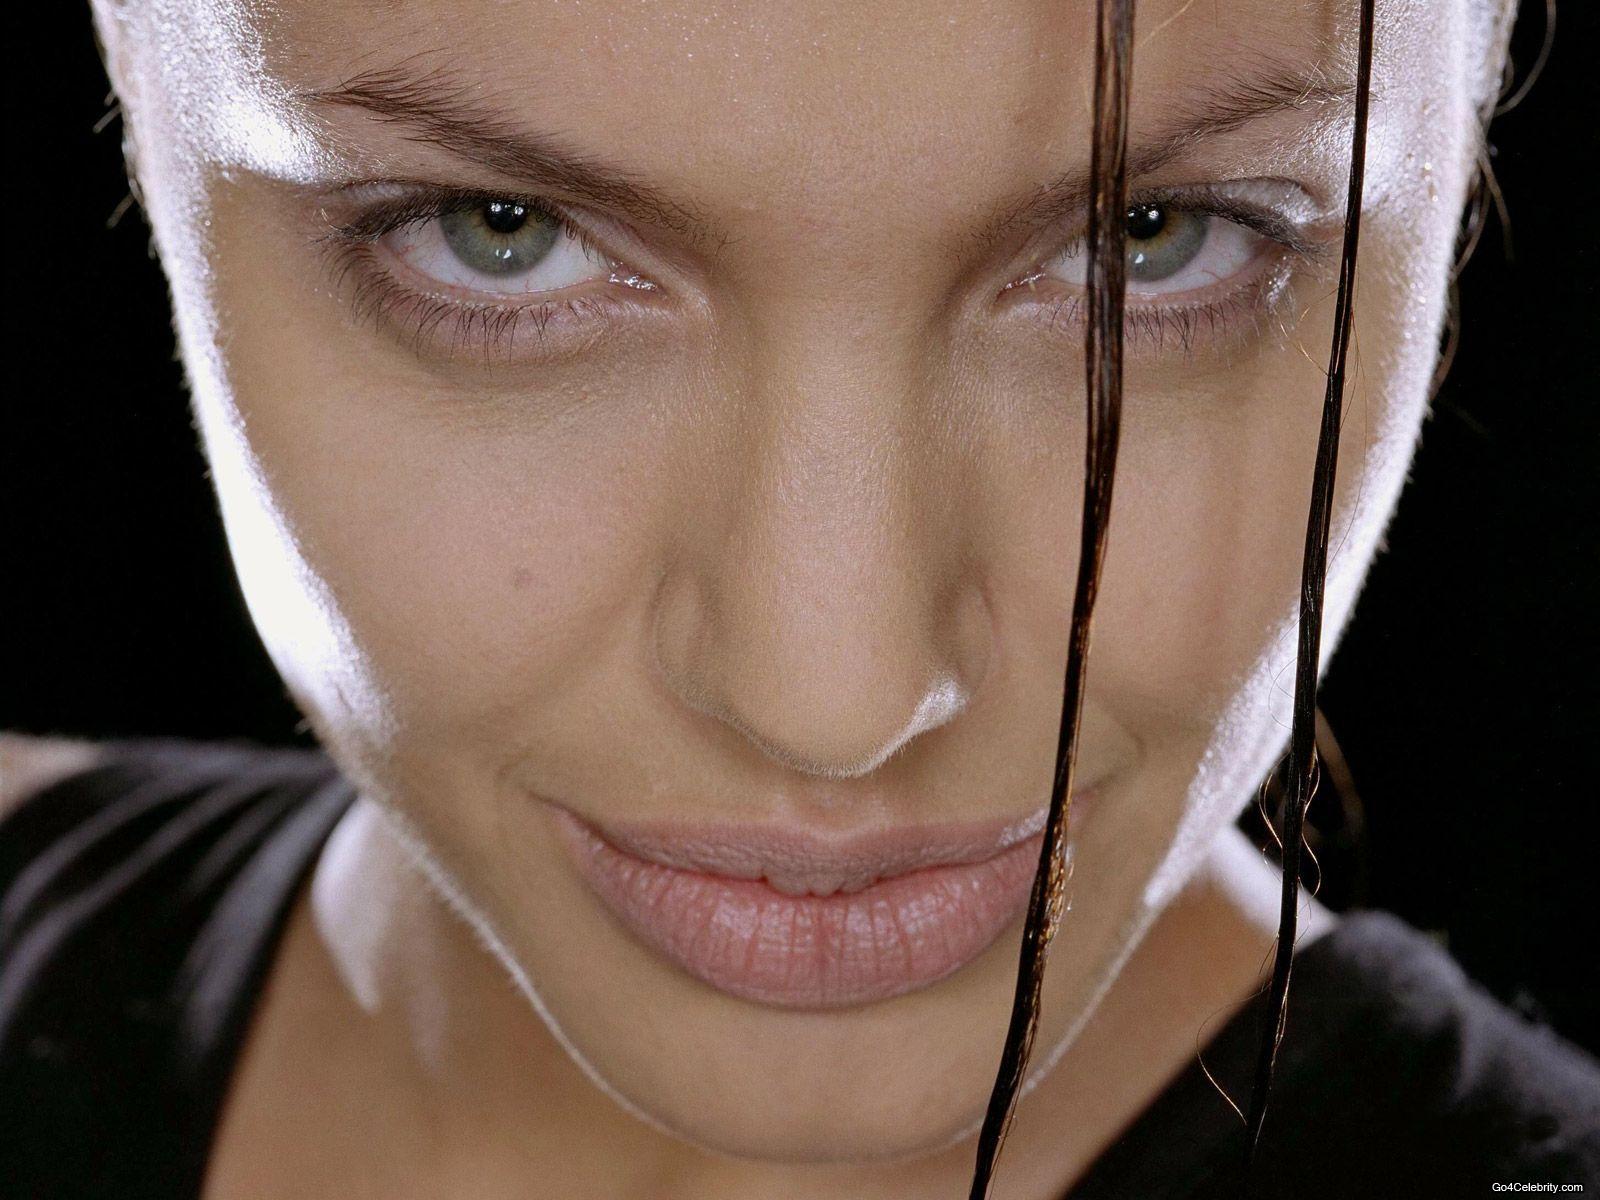 http://3.bp.blogspot.com/-Q41eAENl5kE/UBTlJA-xT9I/AAAAAAAAMbs/0JOUSWsZ1lA/s1600/Angelina-Jolie-276.jpg